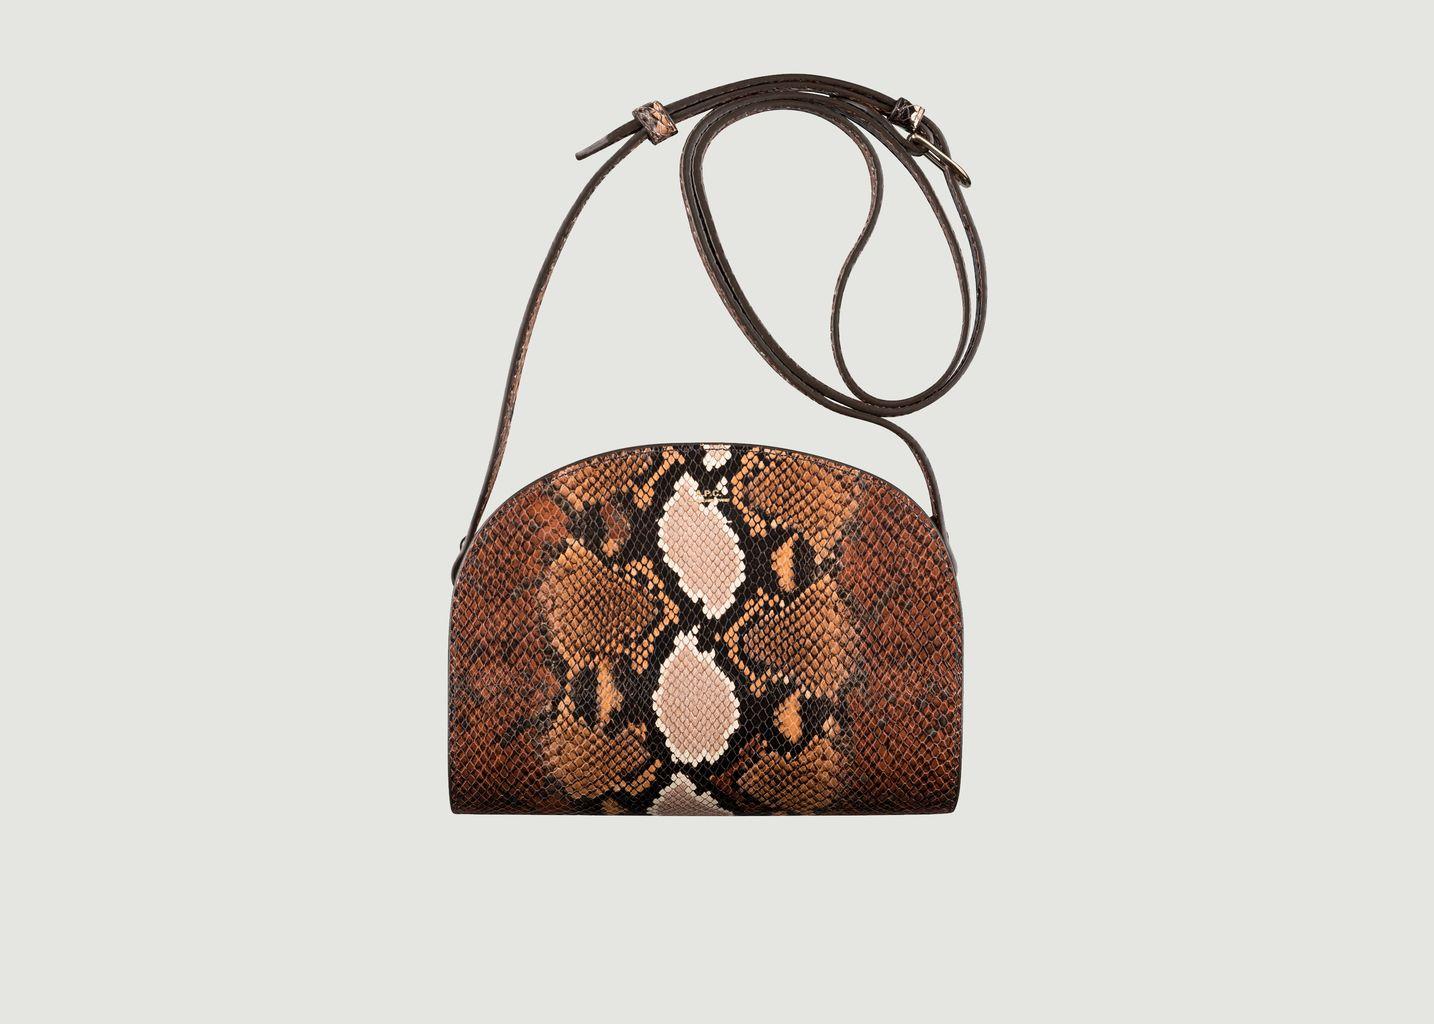 Half Moon Bag Mini Leather Python embossed bag - A.P.C.